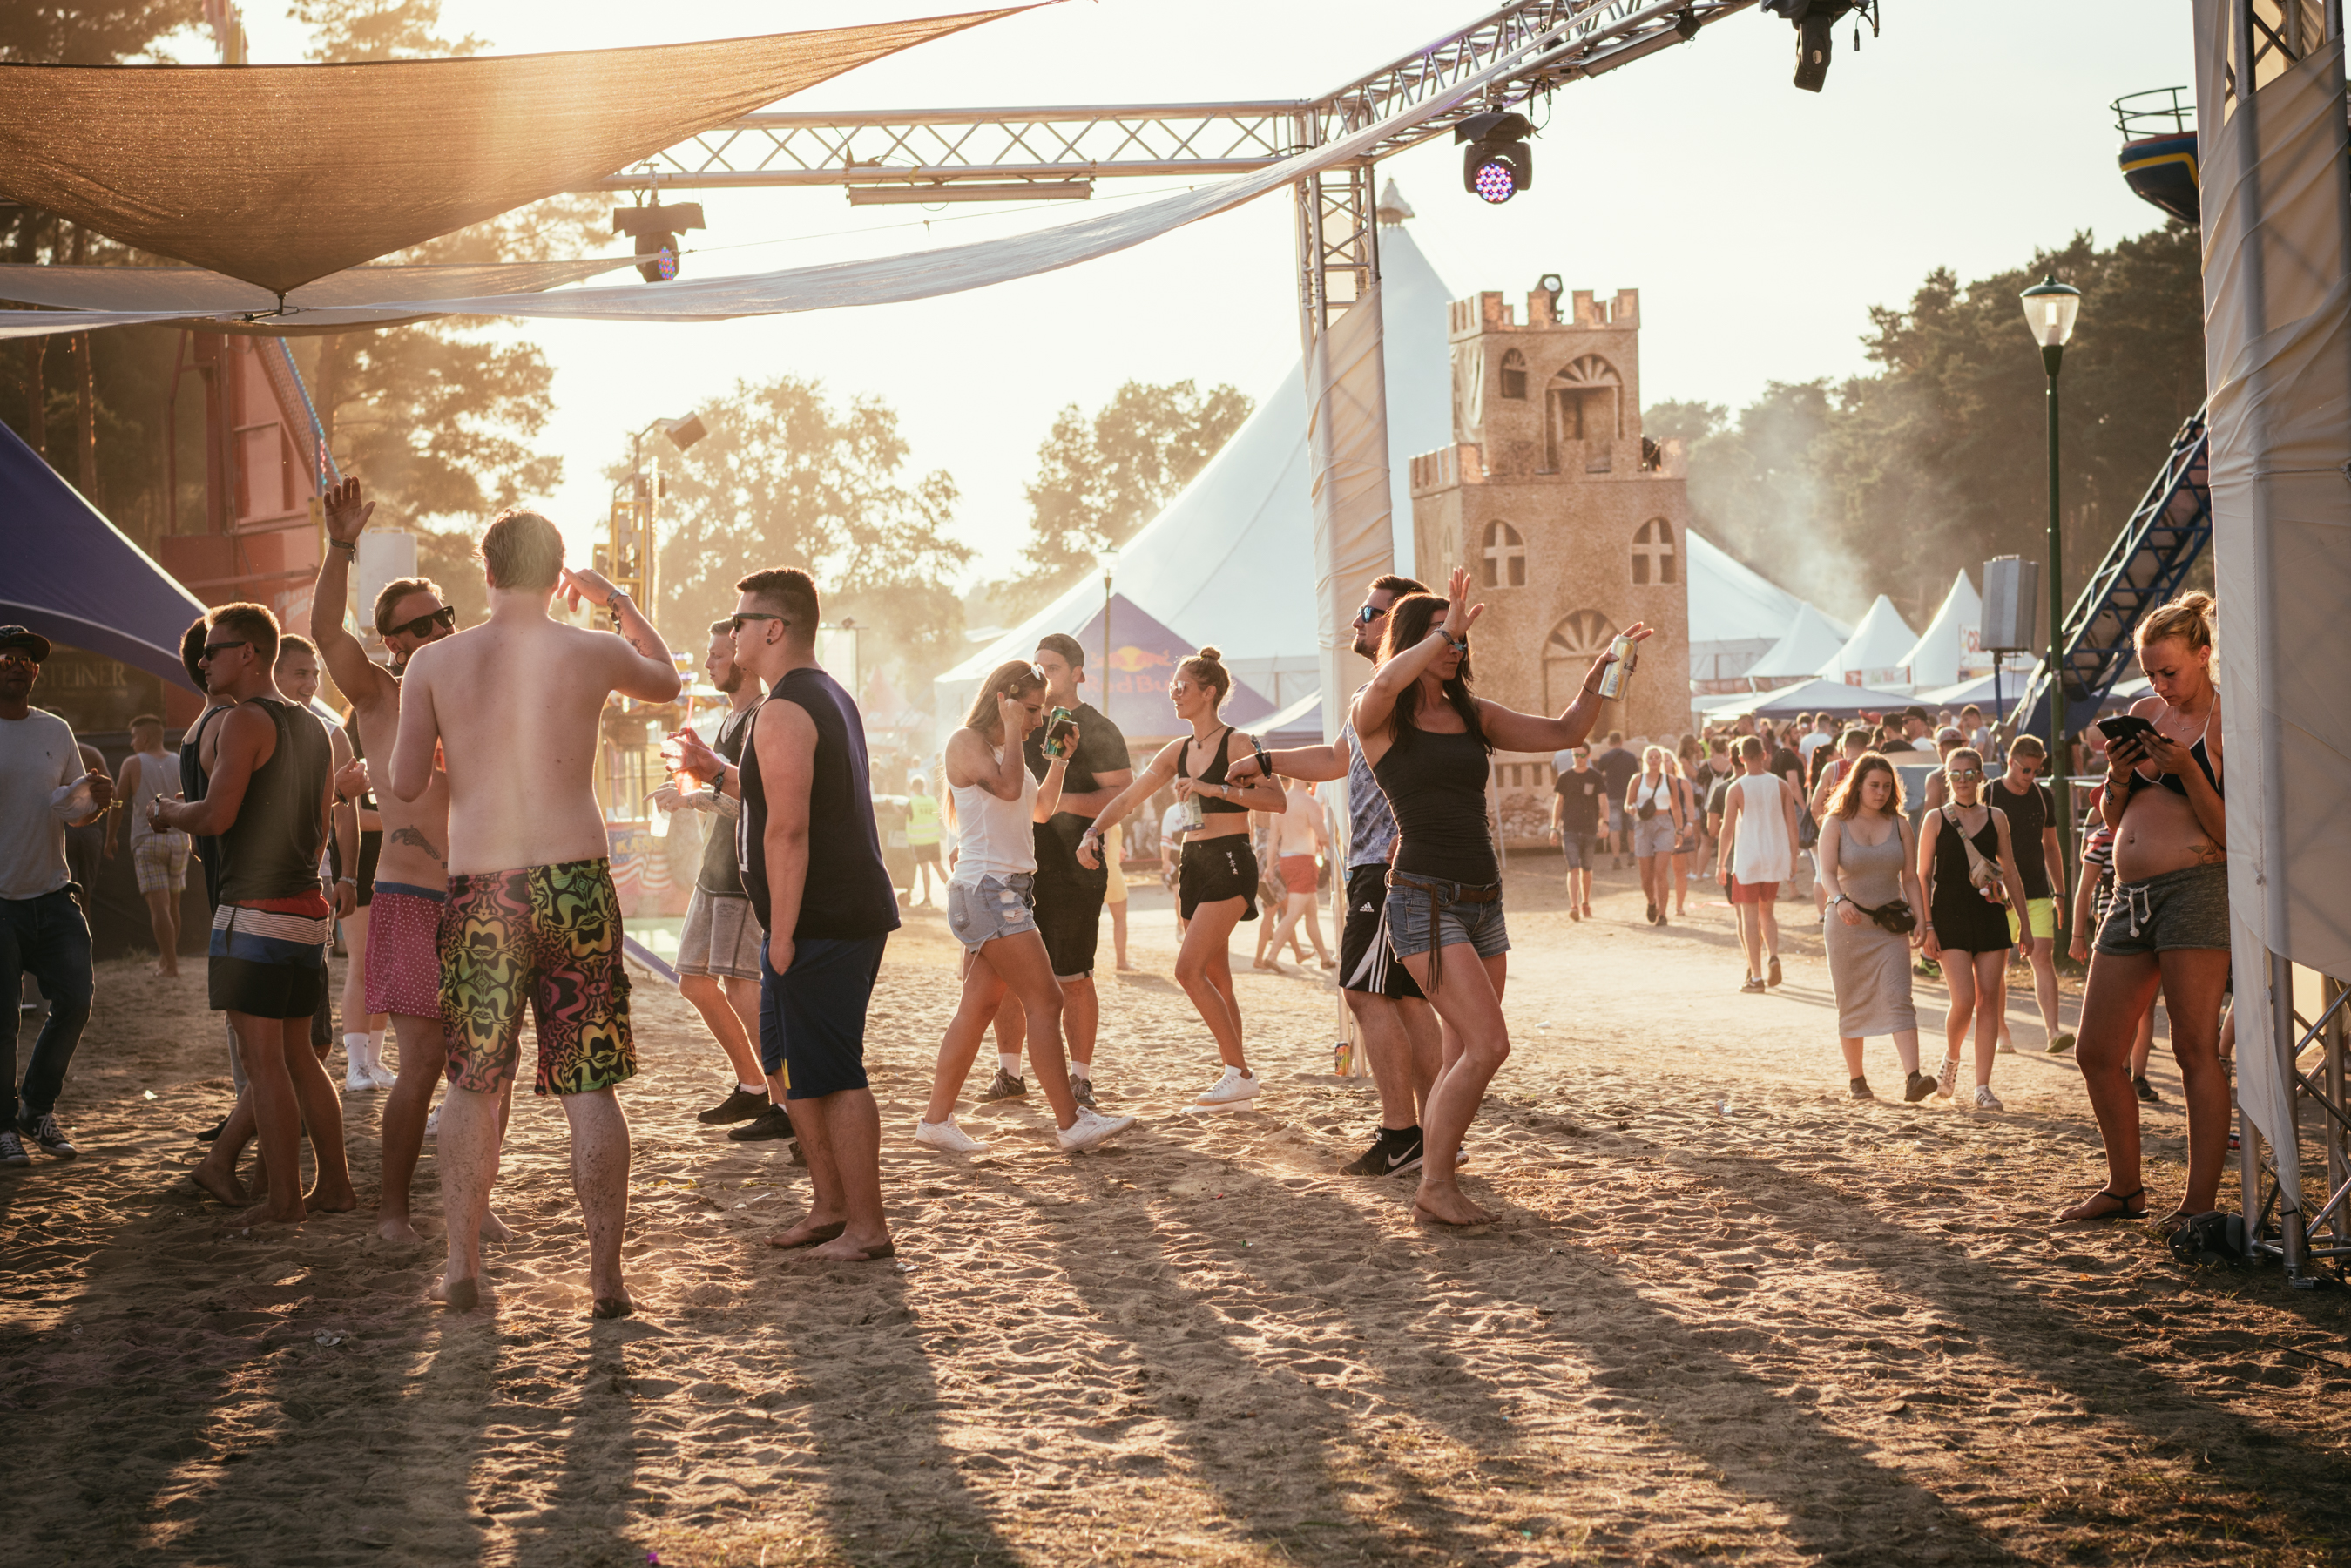 28-07-2018 Helene Beach Festival_Impressions-42